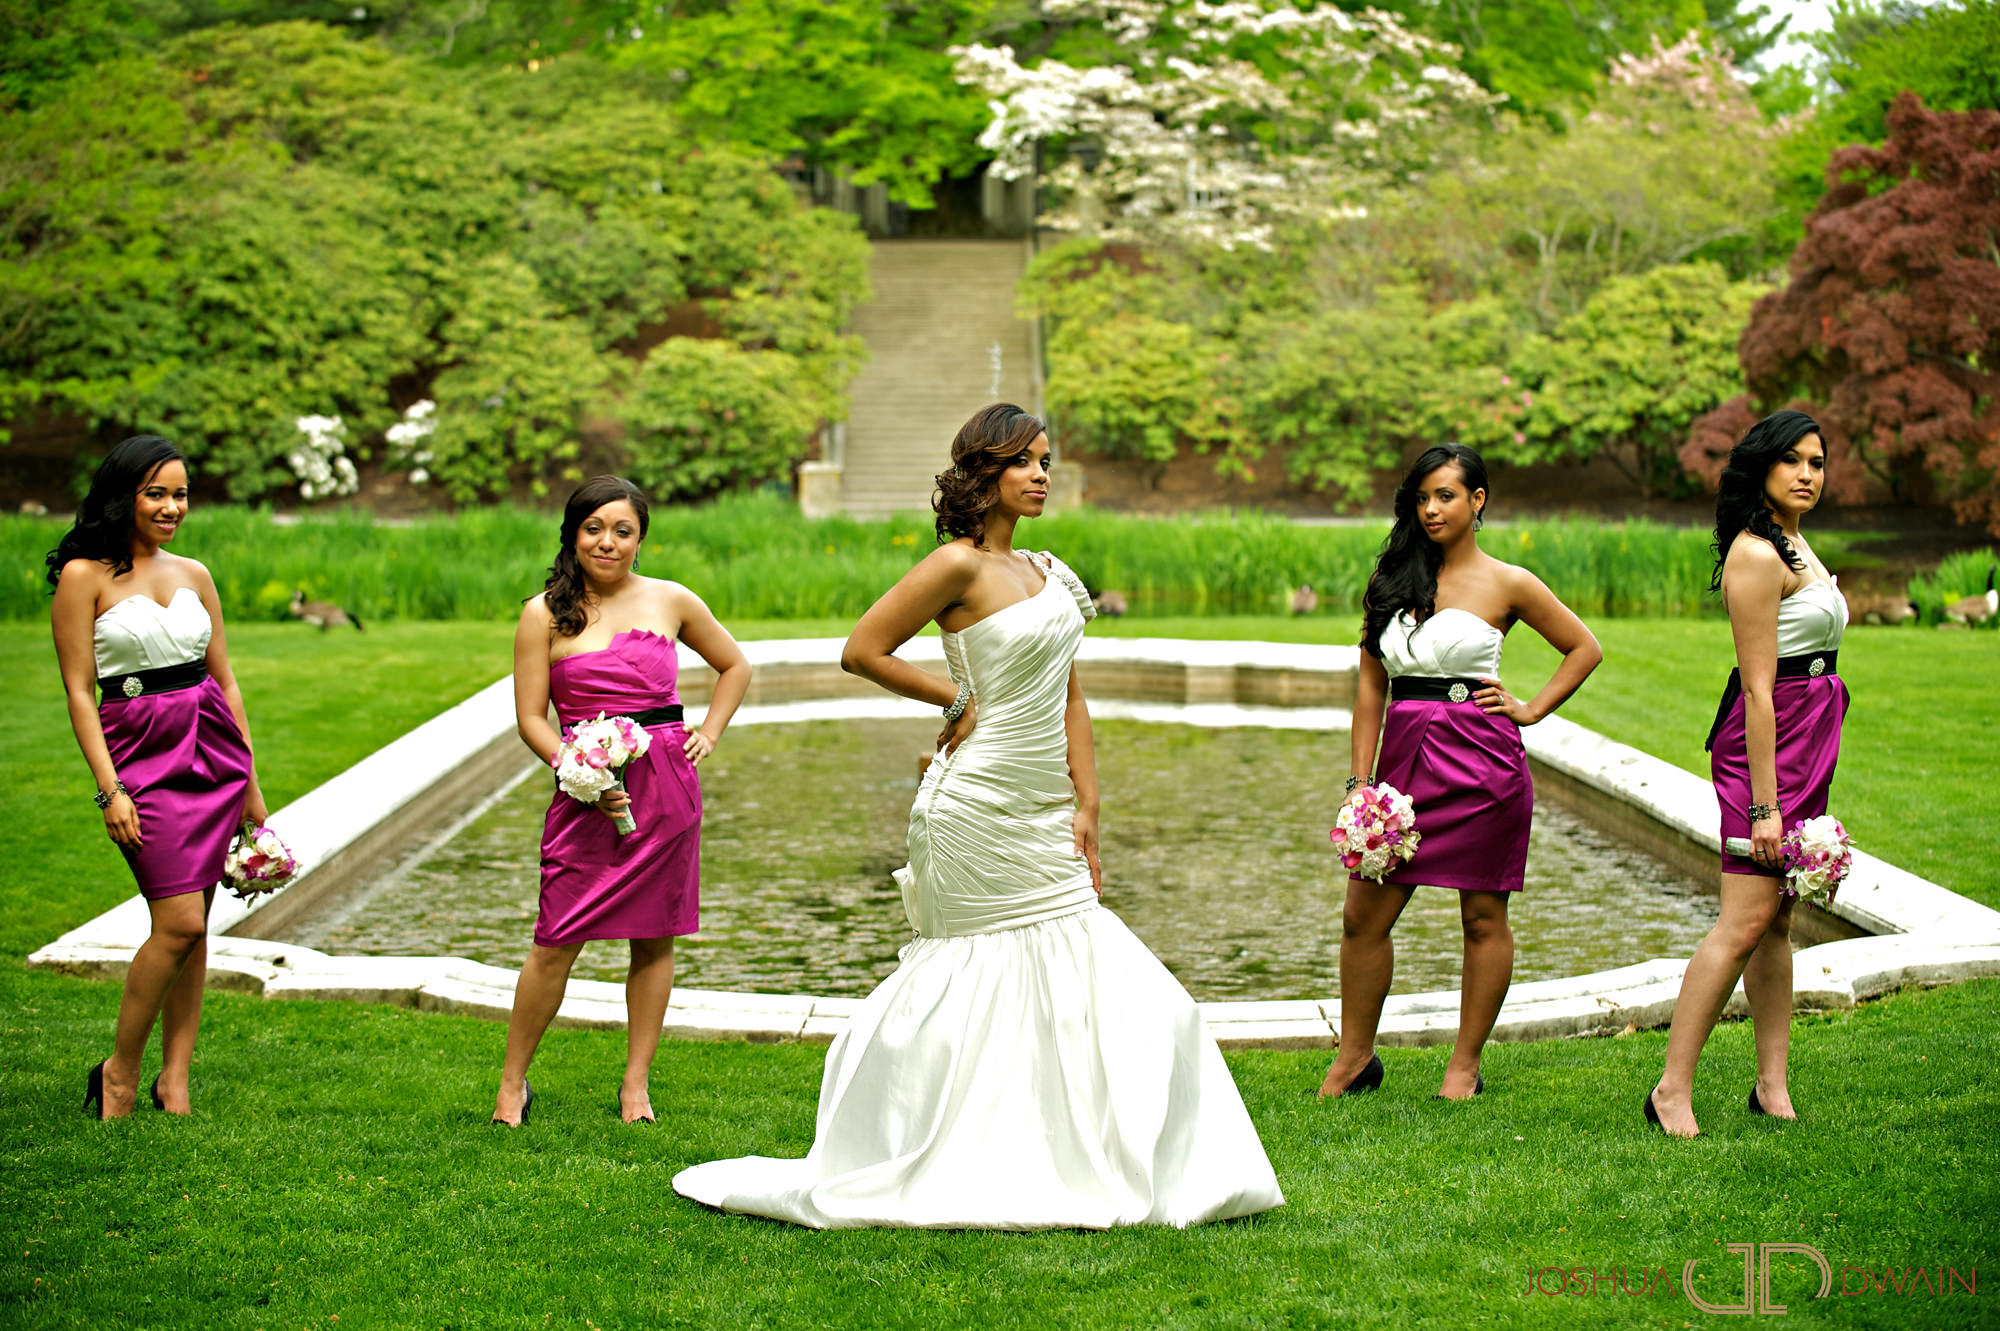 carolina-hector-013-chateau-briandlong-island-new-york-wedding-photographer-joshua-dwain-2011-05-13_ch_0391